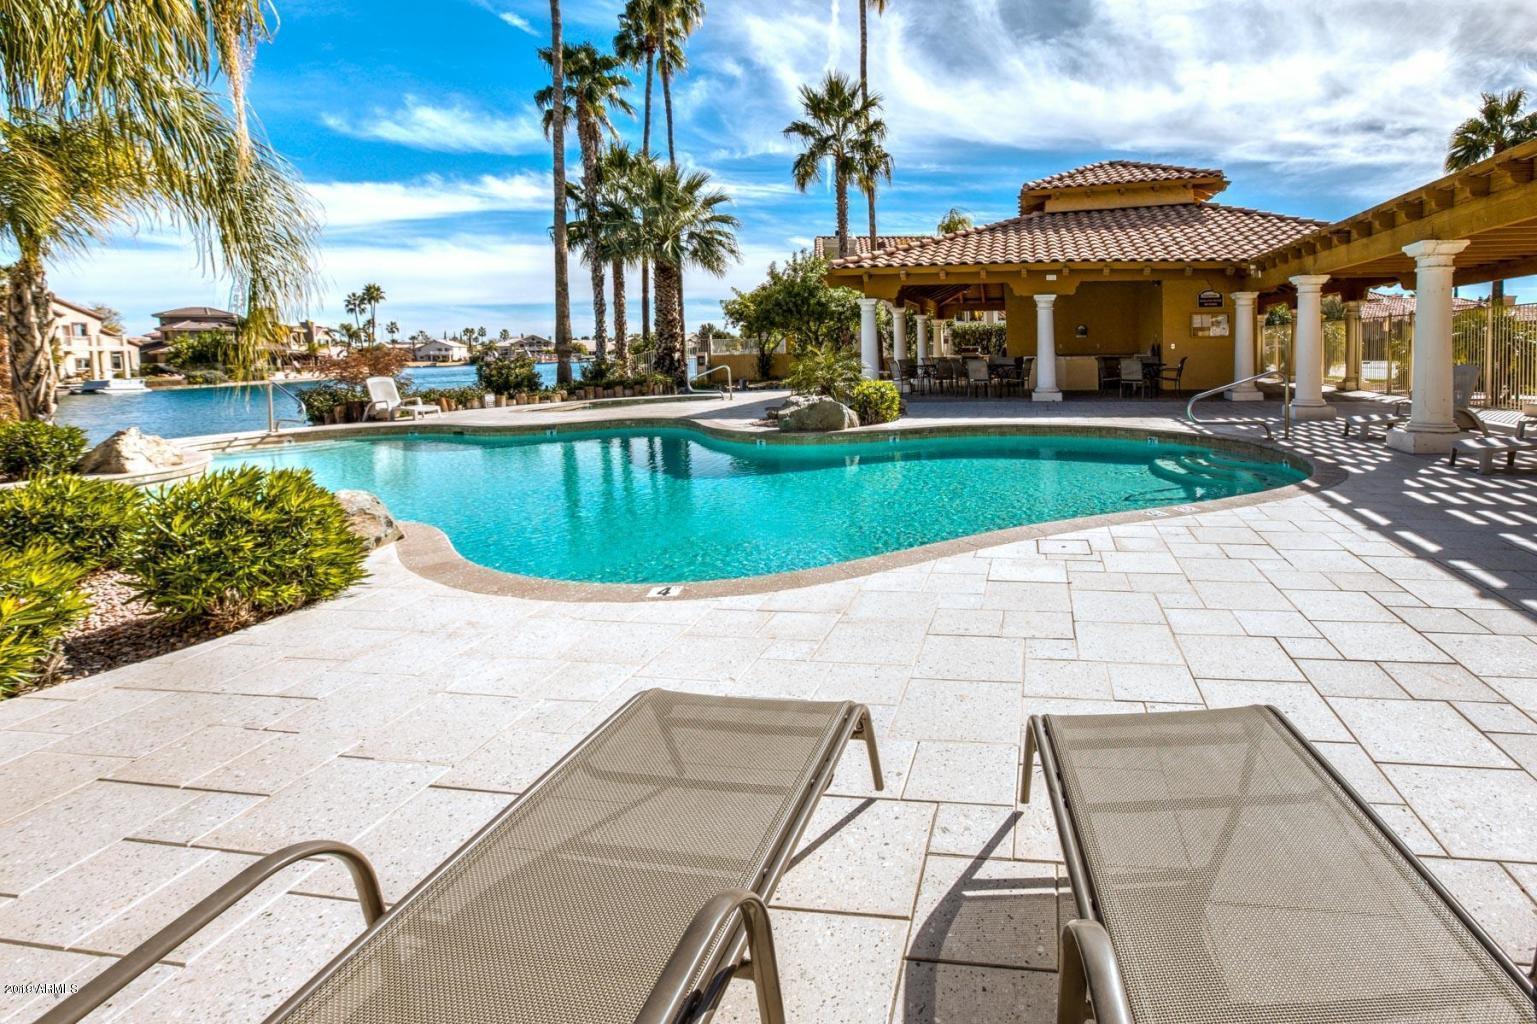 MLS 5932313 449 S MARINA Drive, Gilbert, AZ Gilbert AZ Condo or Townhome